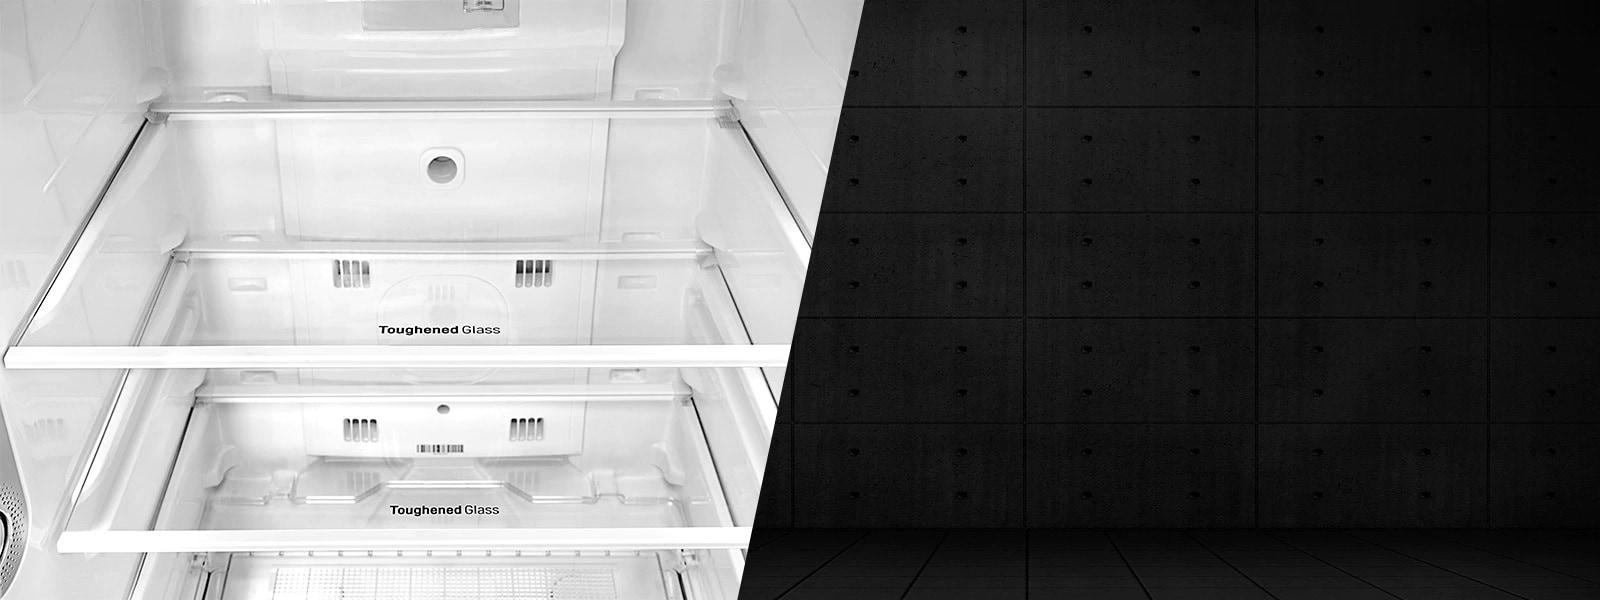 LG GL-T302RPZX Toughened Glass Shelves